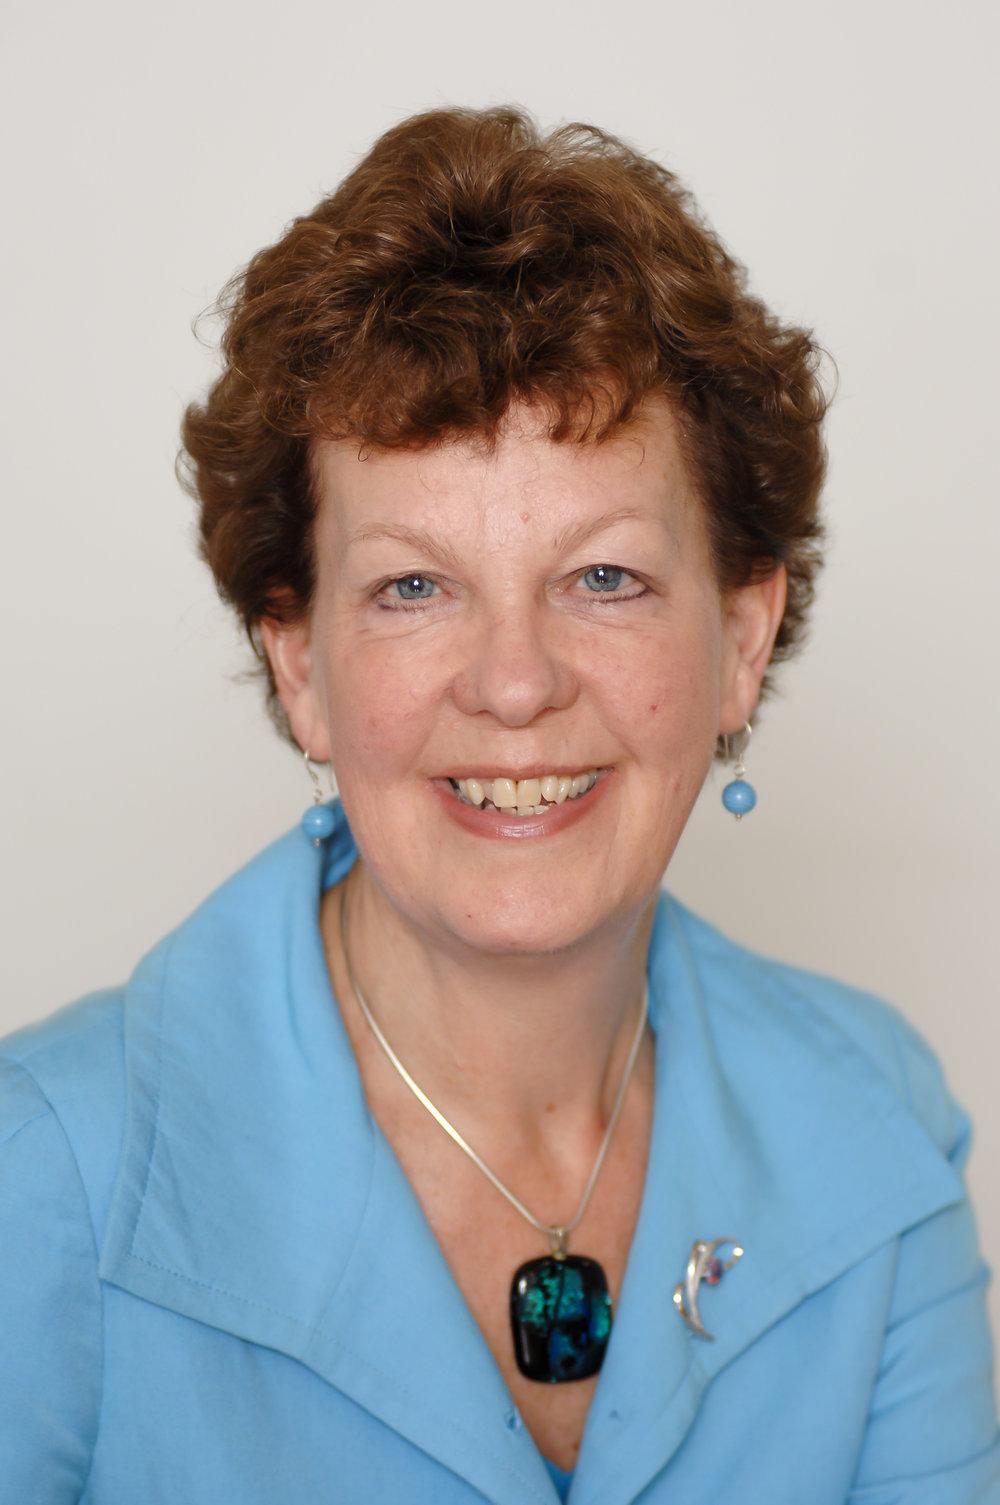 Jane Furniss CBE